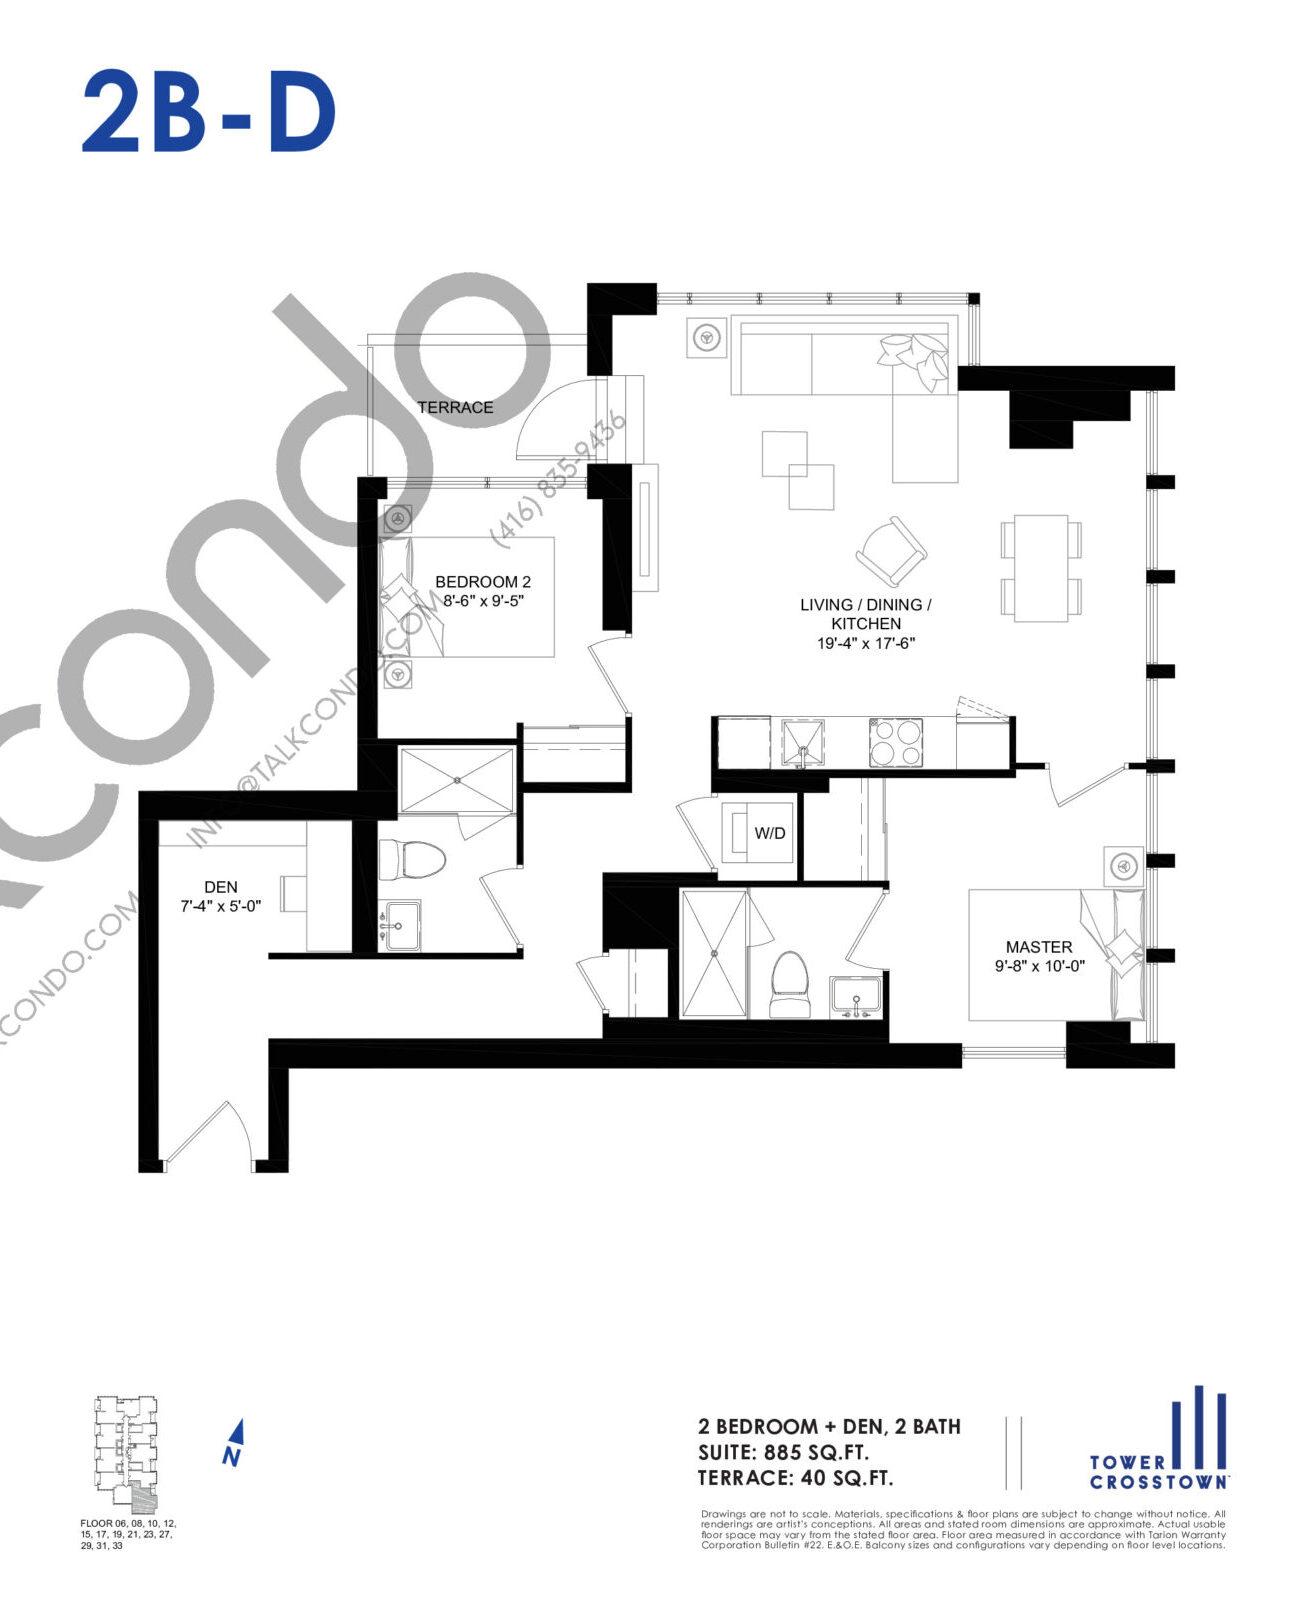 2B-D Floor Plan at Crosstown Tower 3 Condos - 885 sq.ft